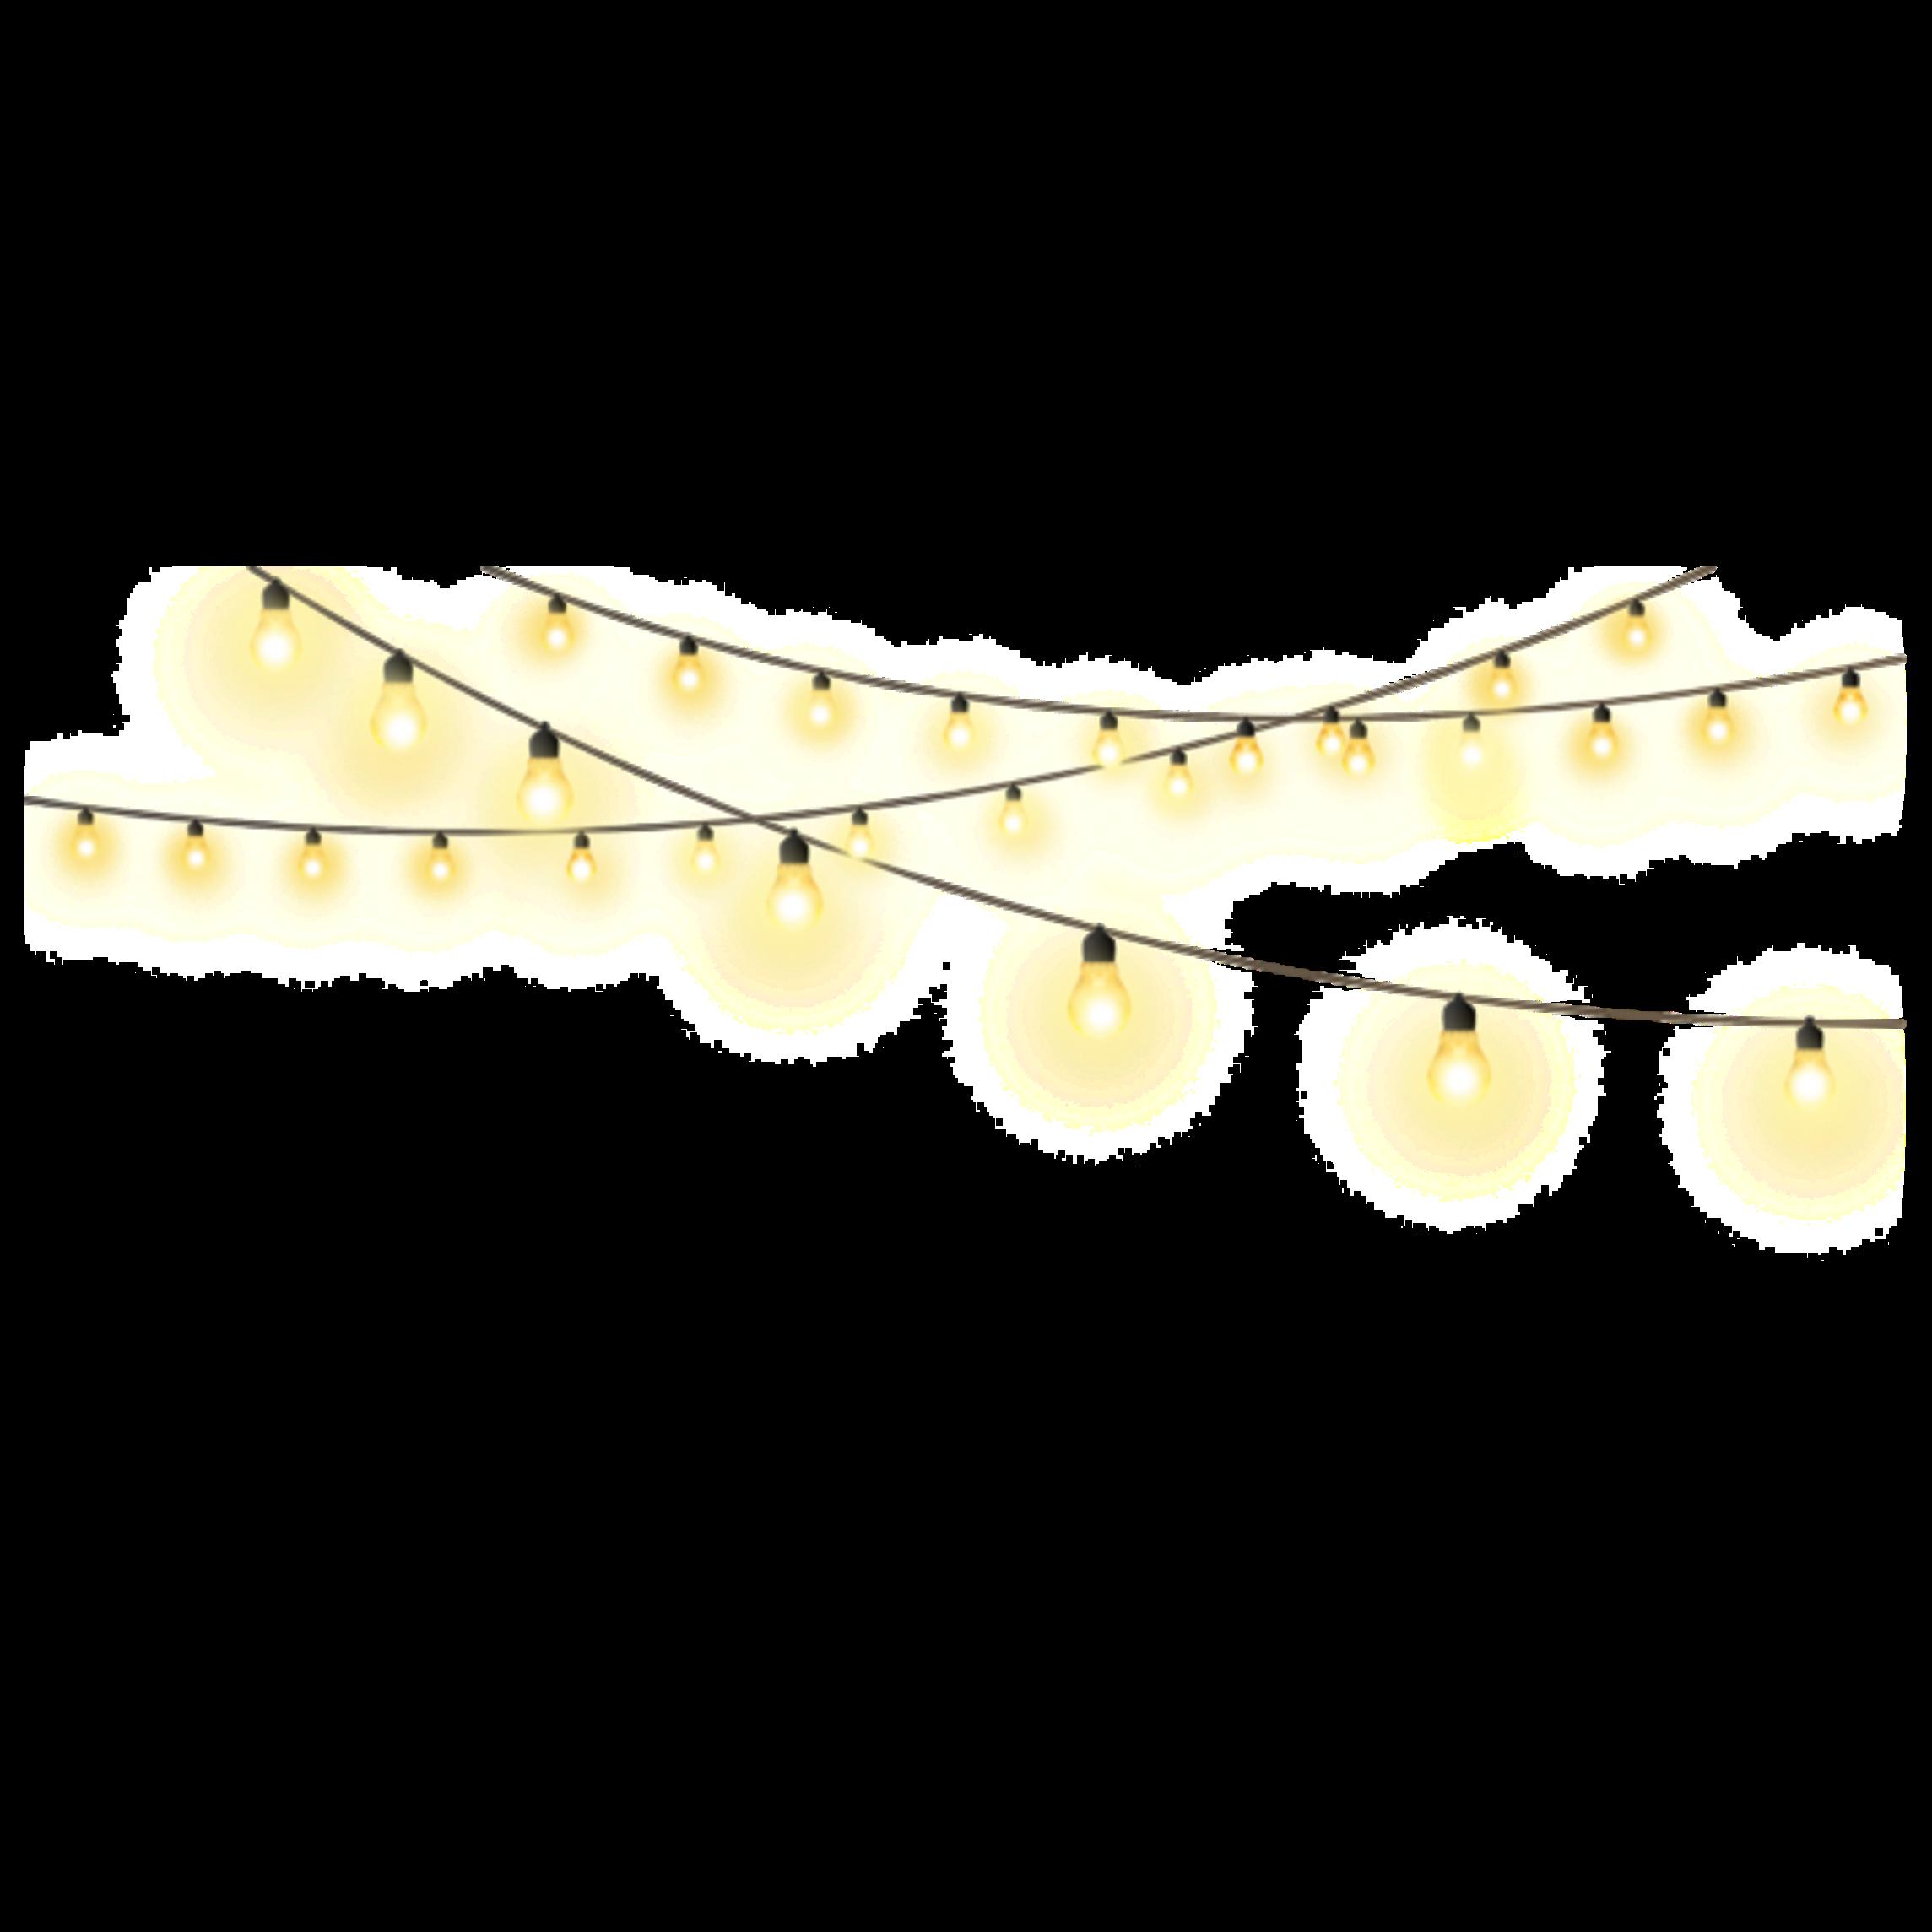 Lights Light Tumblr Asthetic Honeycollage Collage Yello